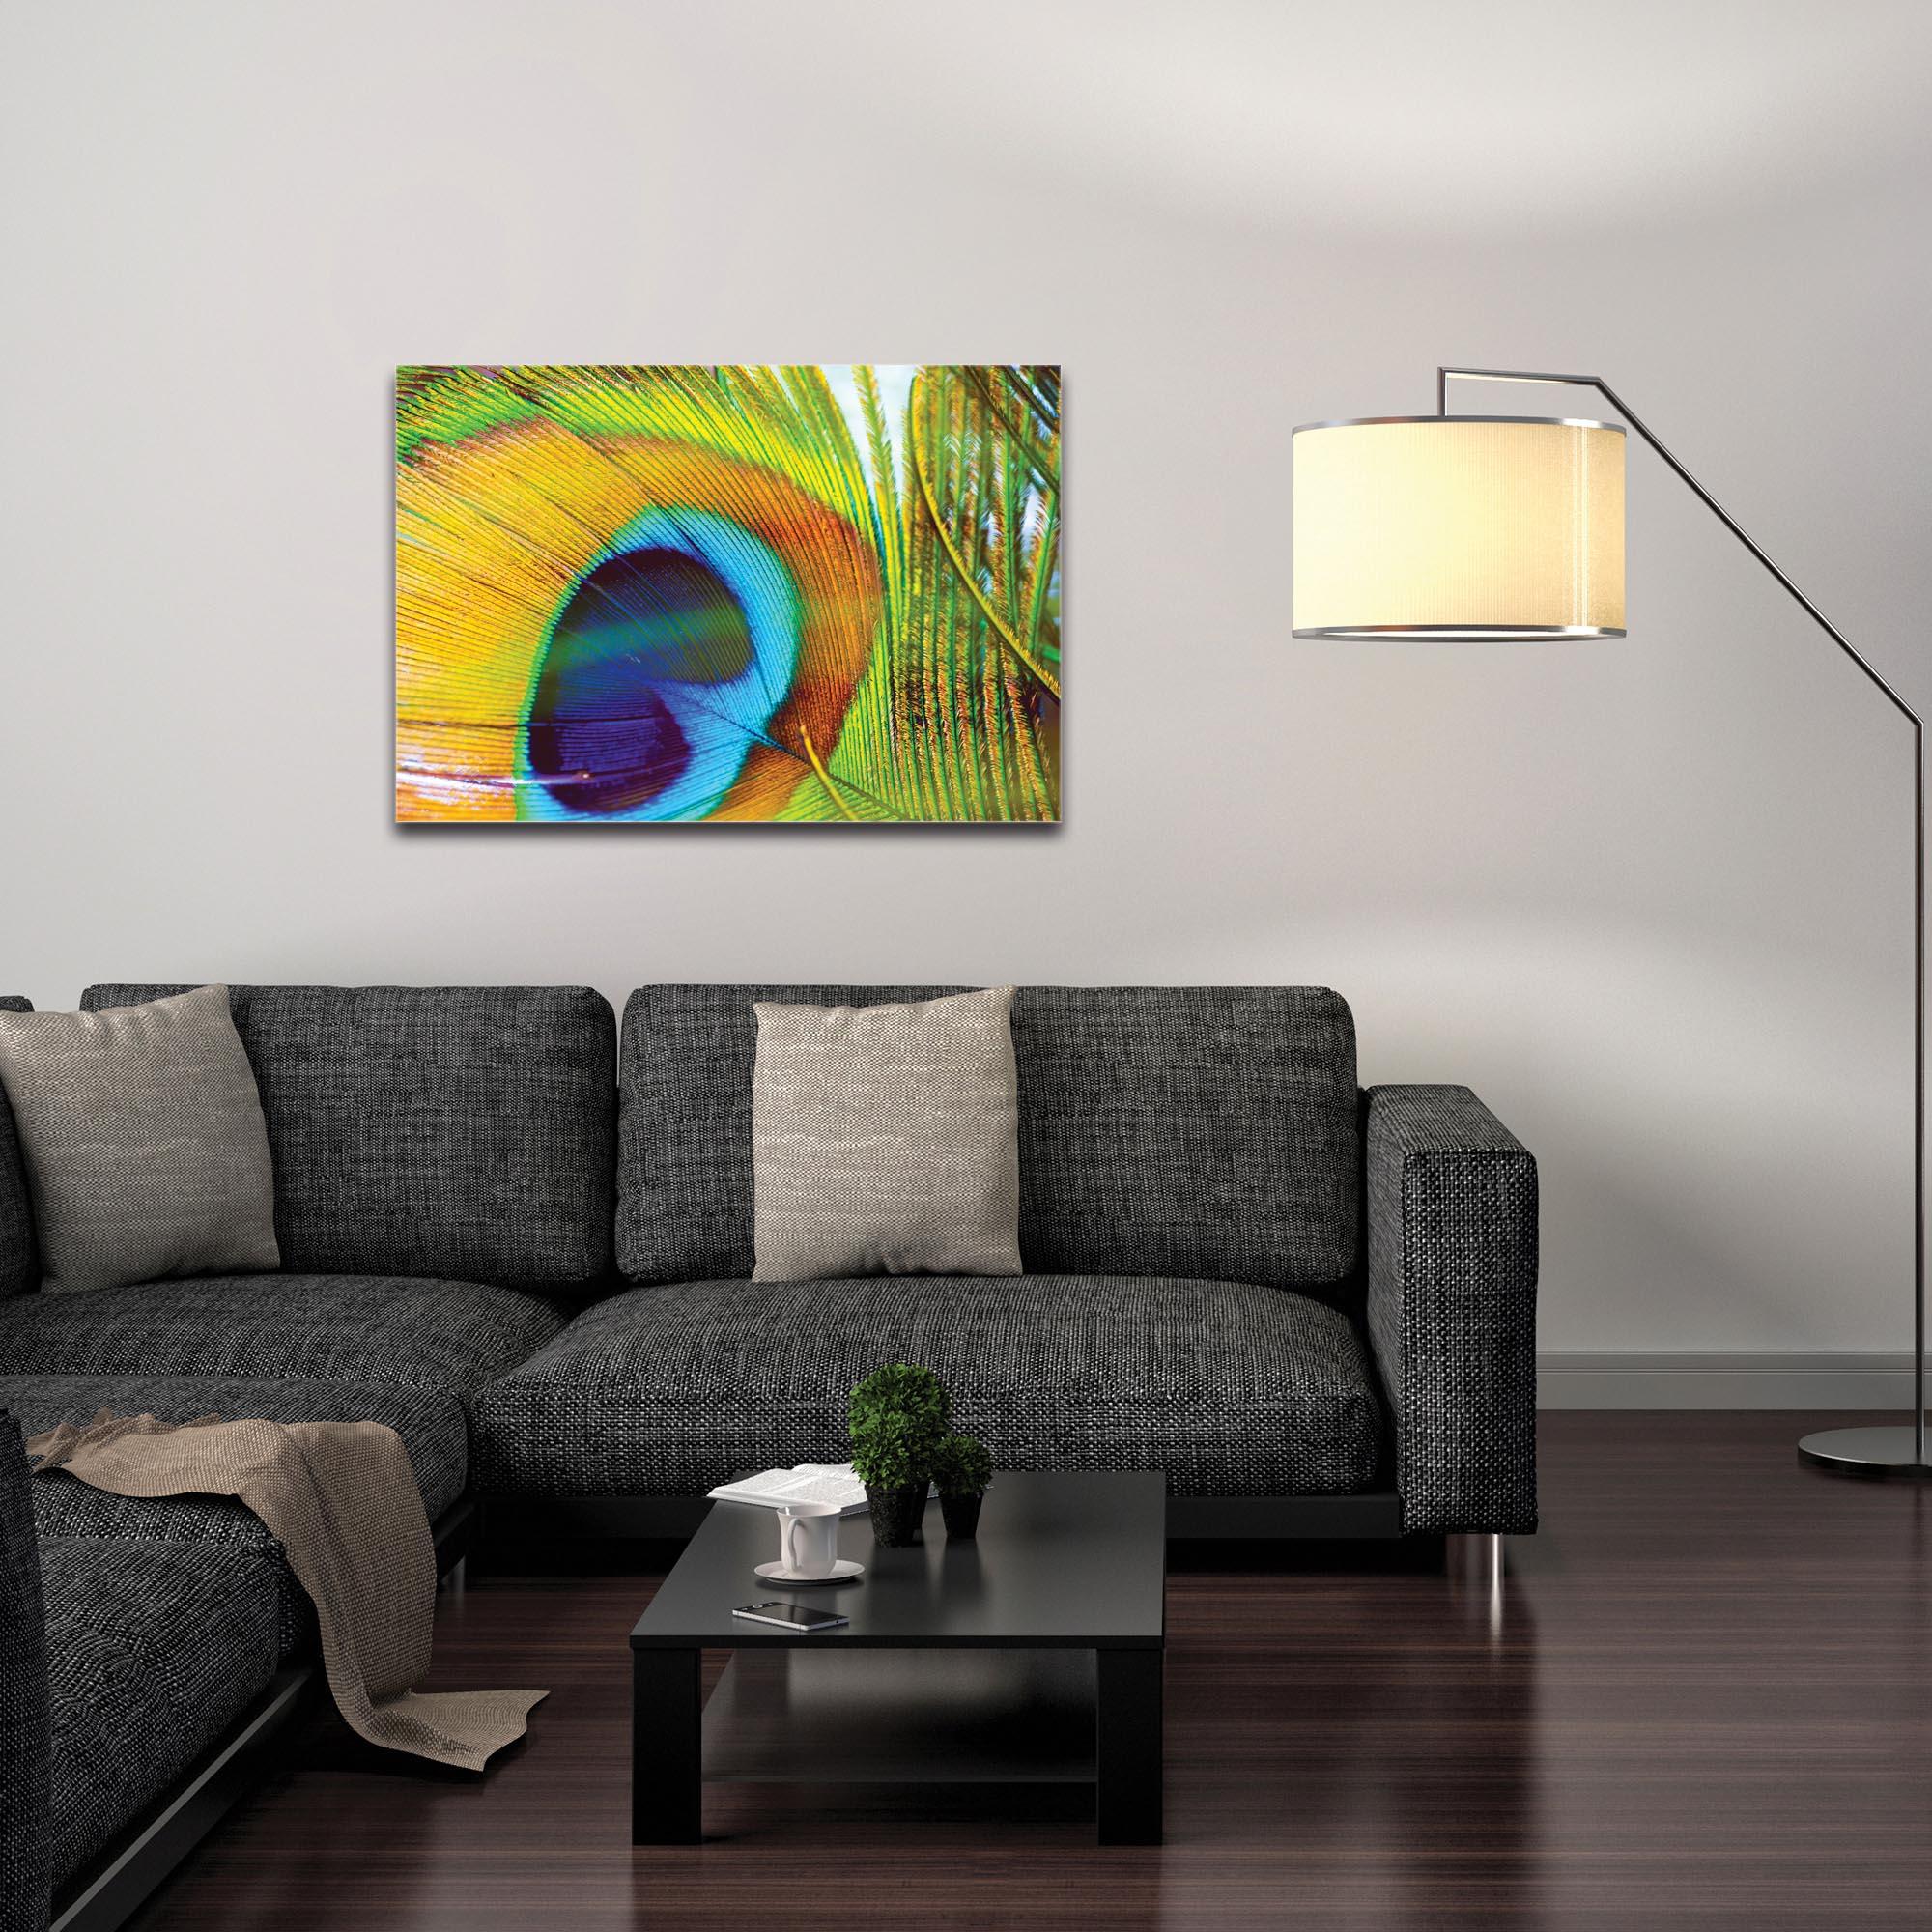 Contemporary Wall Art 'Peacock Colors' - Wildlife Decor on Metal or Plexiglass - Image 3